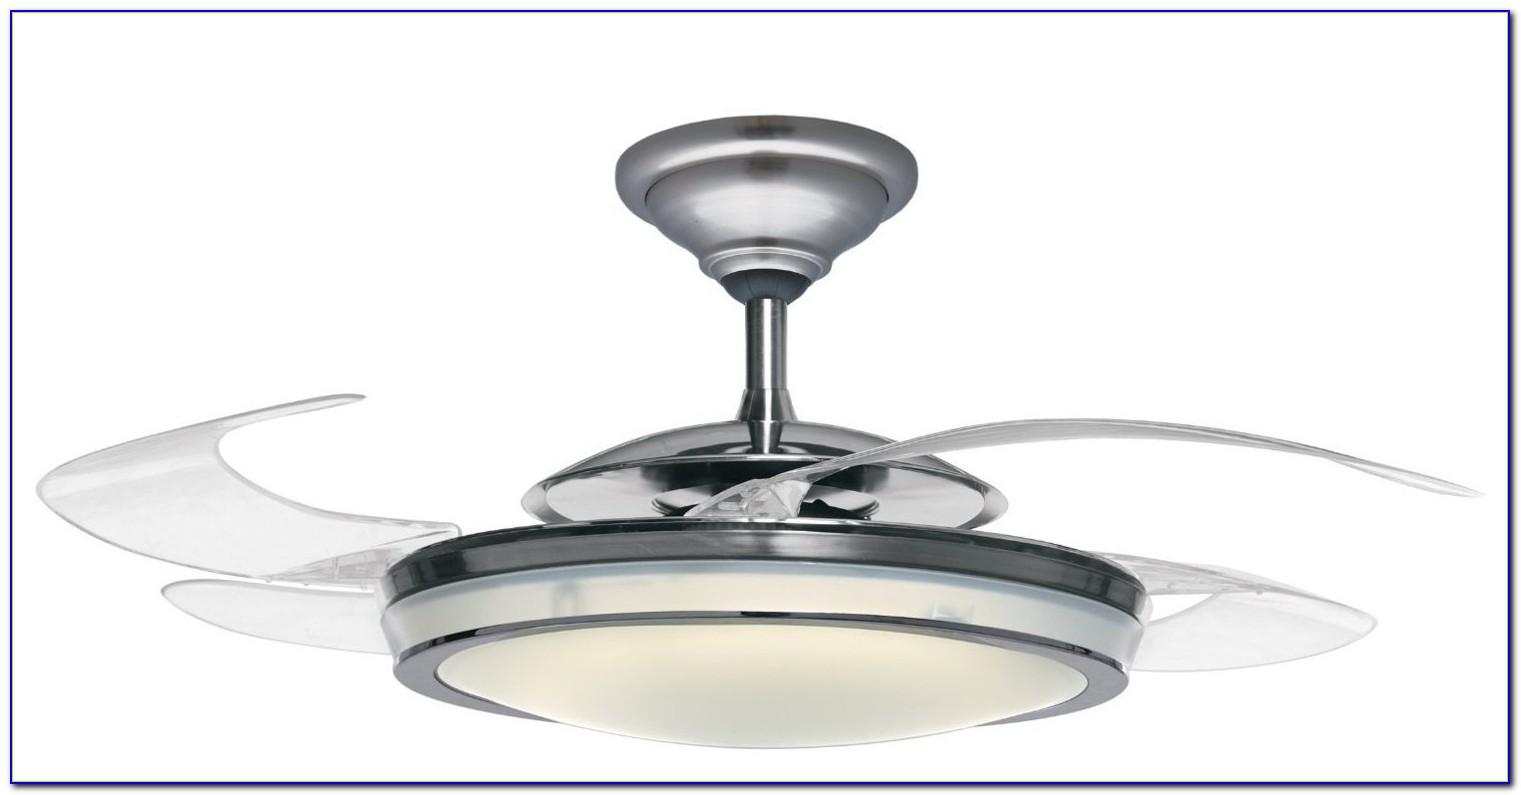 Clear Ceiling Fan Blades